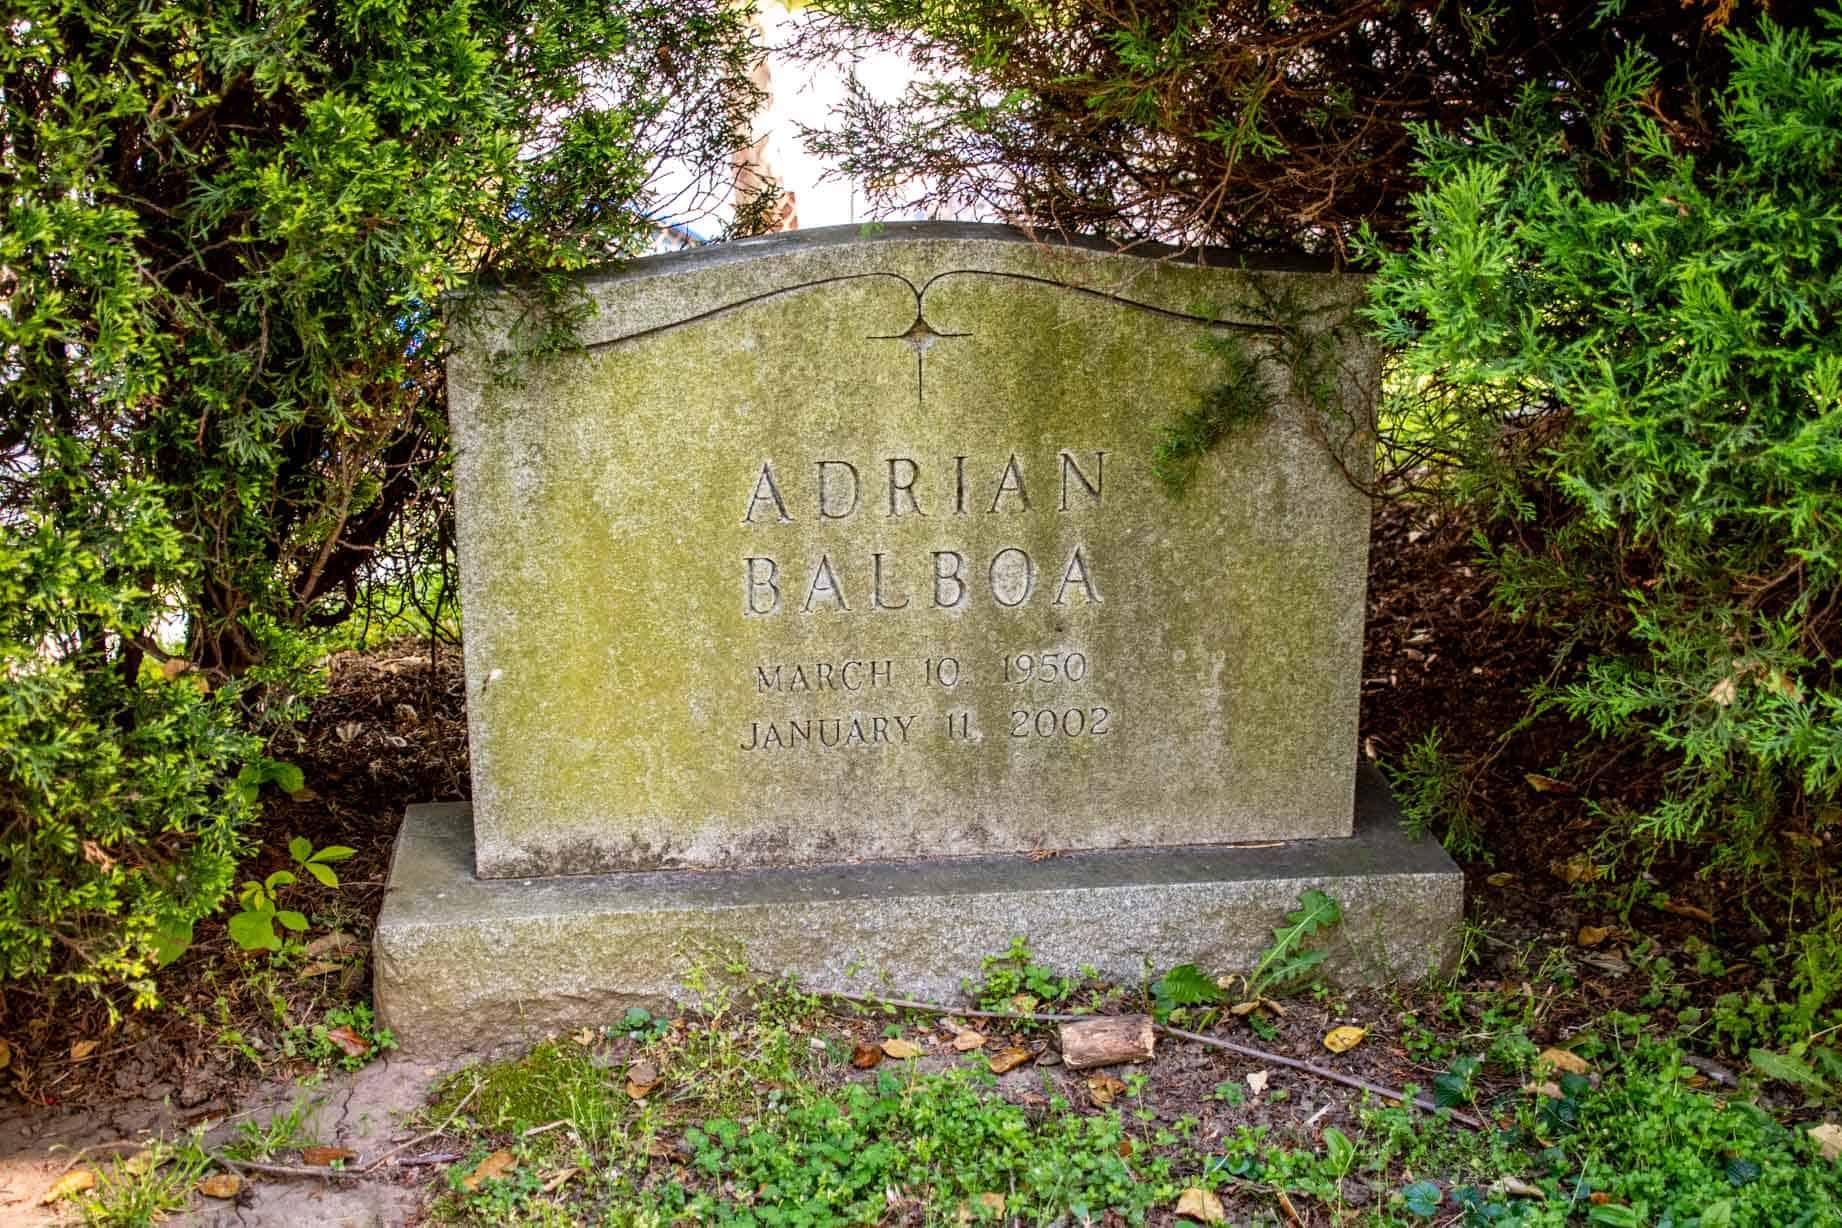 Headstone for Adrian Balboa